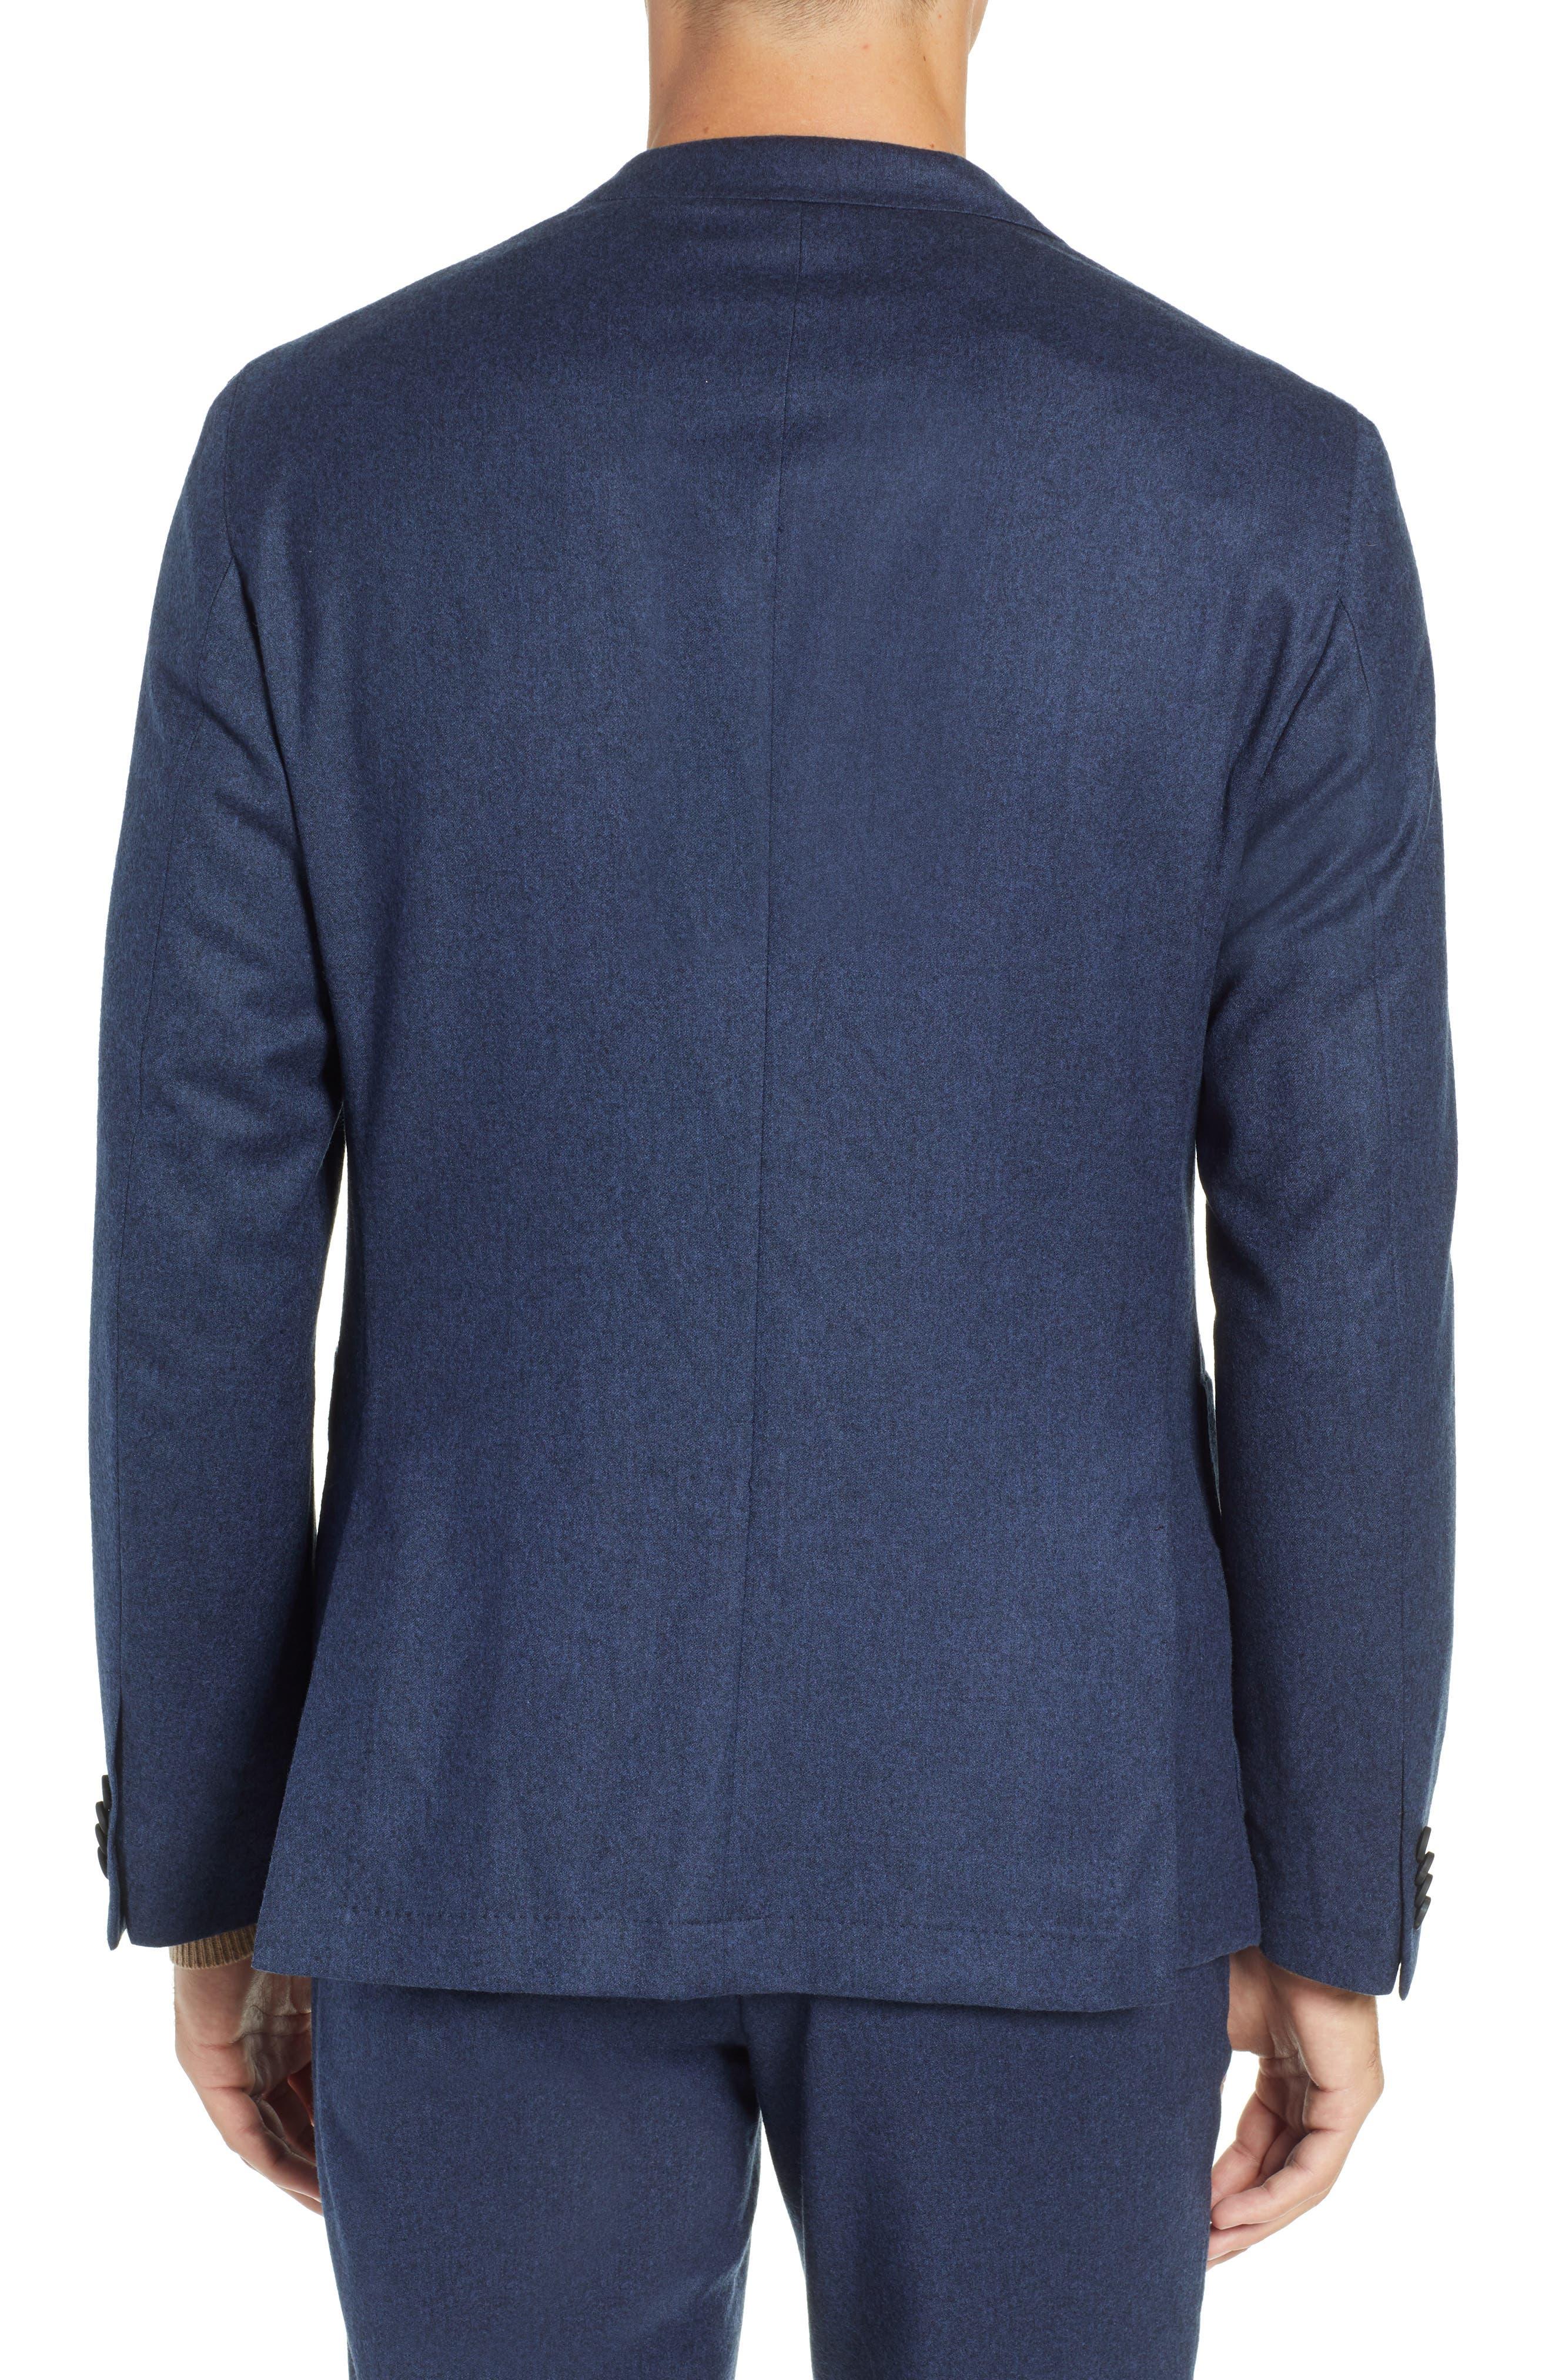 Hooper Trim Fit Wool Blazer,                             Alternate thumbnail 2, color,                             DARK BLUE